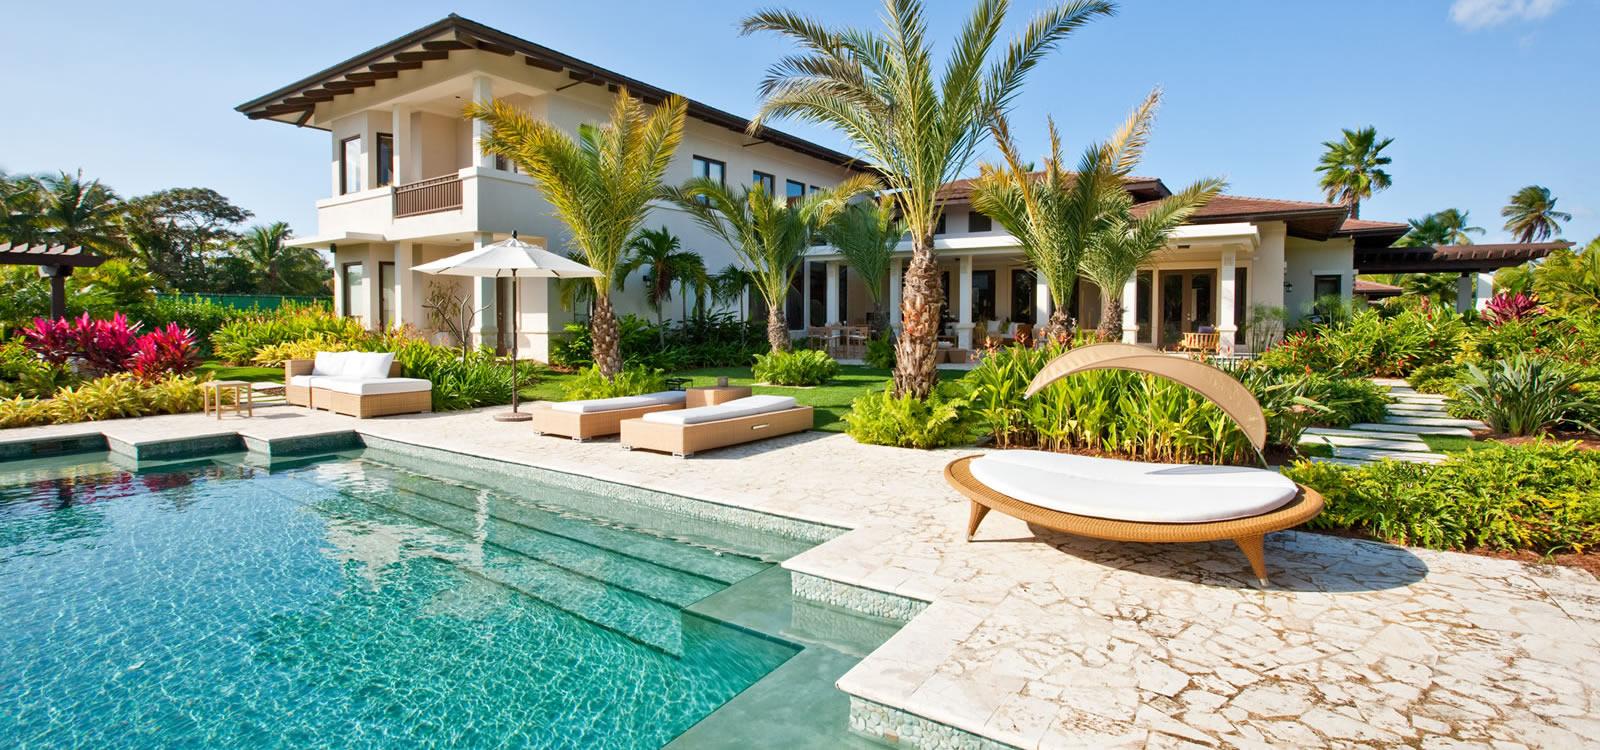 custom luxury homes for sale in beach resort rio grande